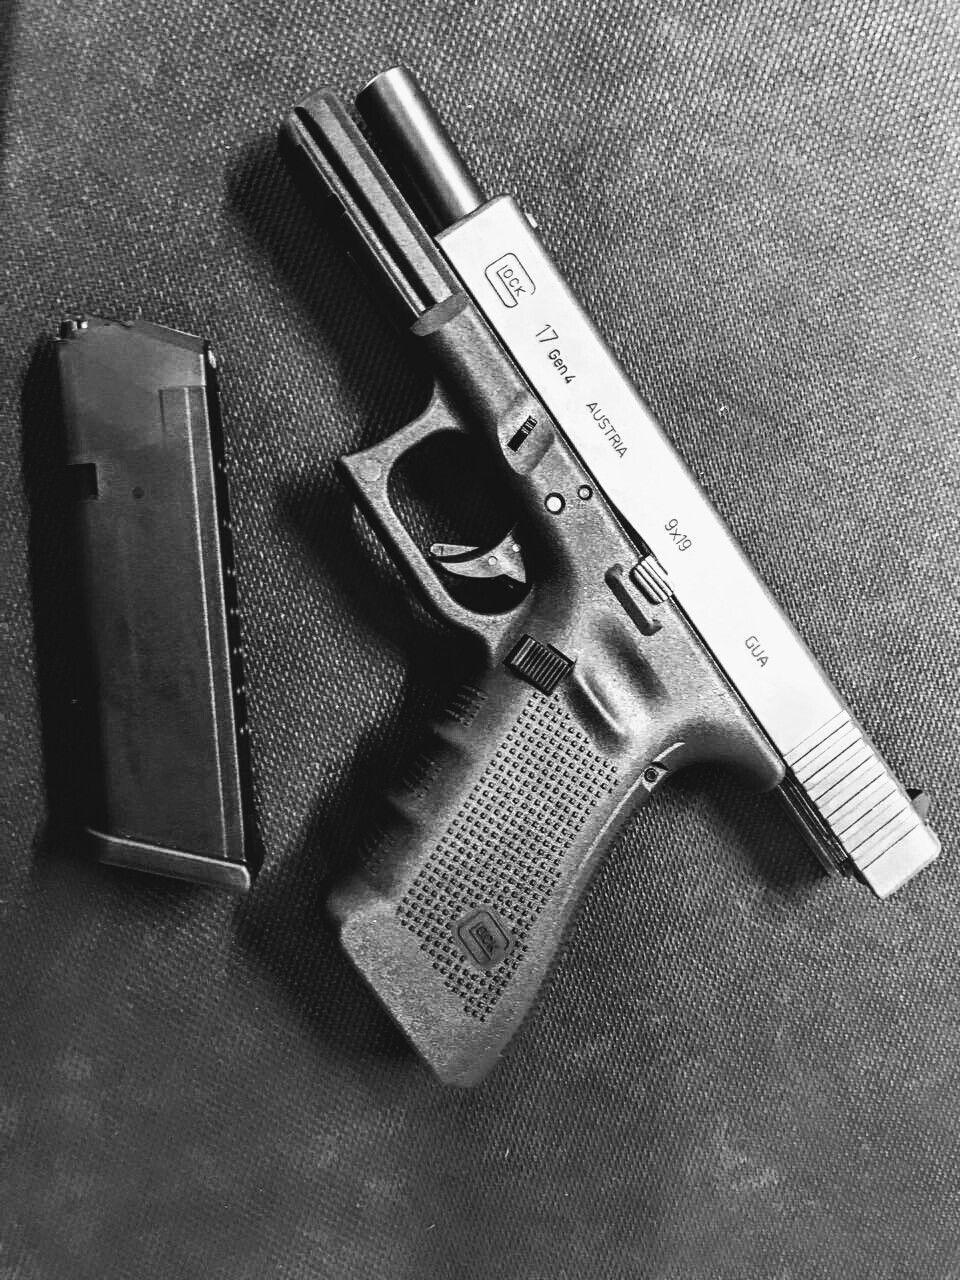 Glock 17 Generación 4 Cal 9 mm AUSTRIA | de Marco Armas | Pinterest